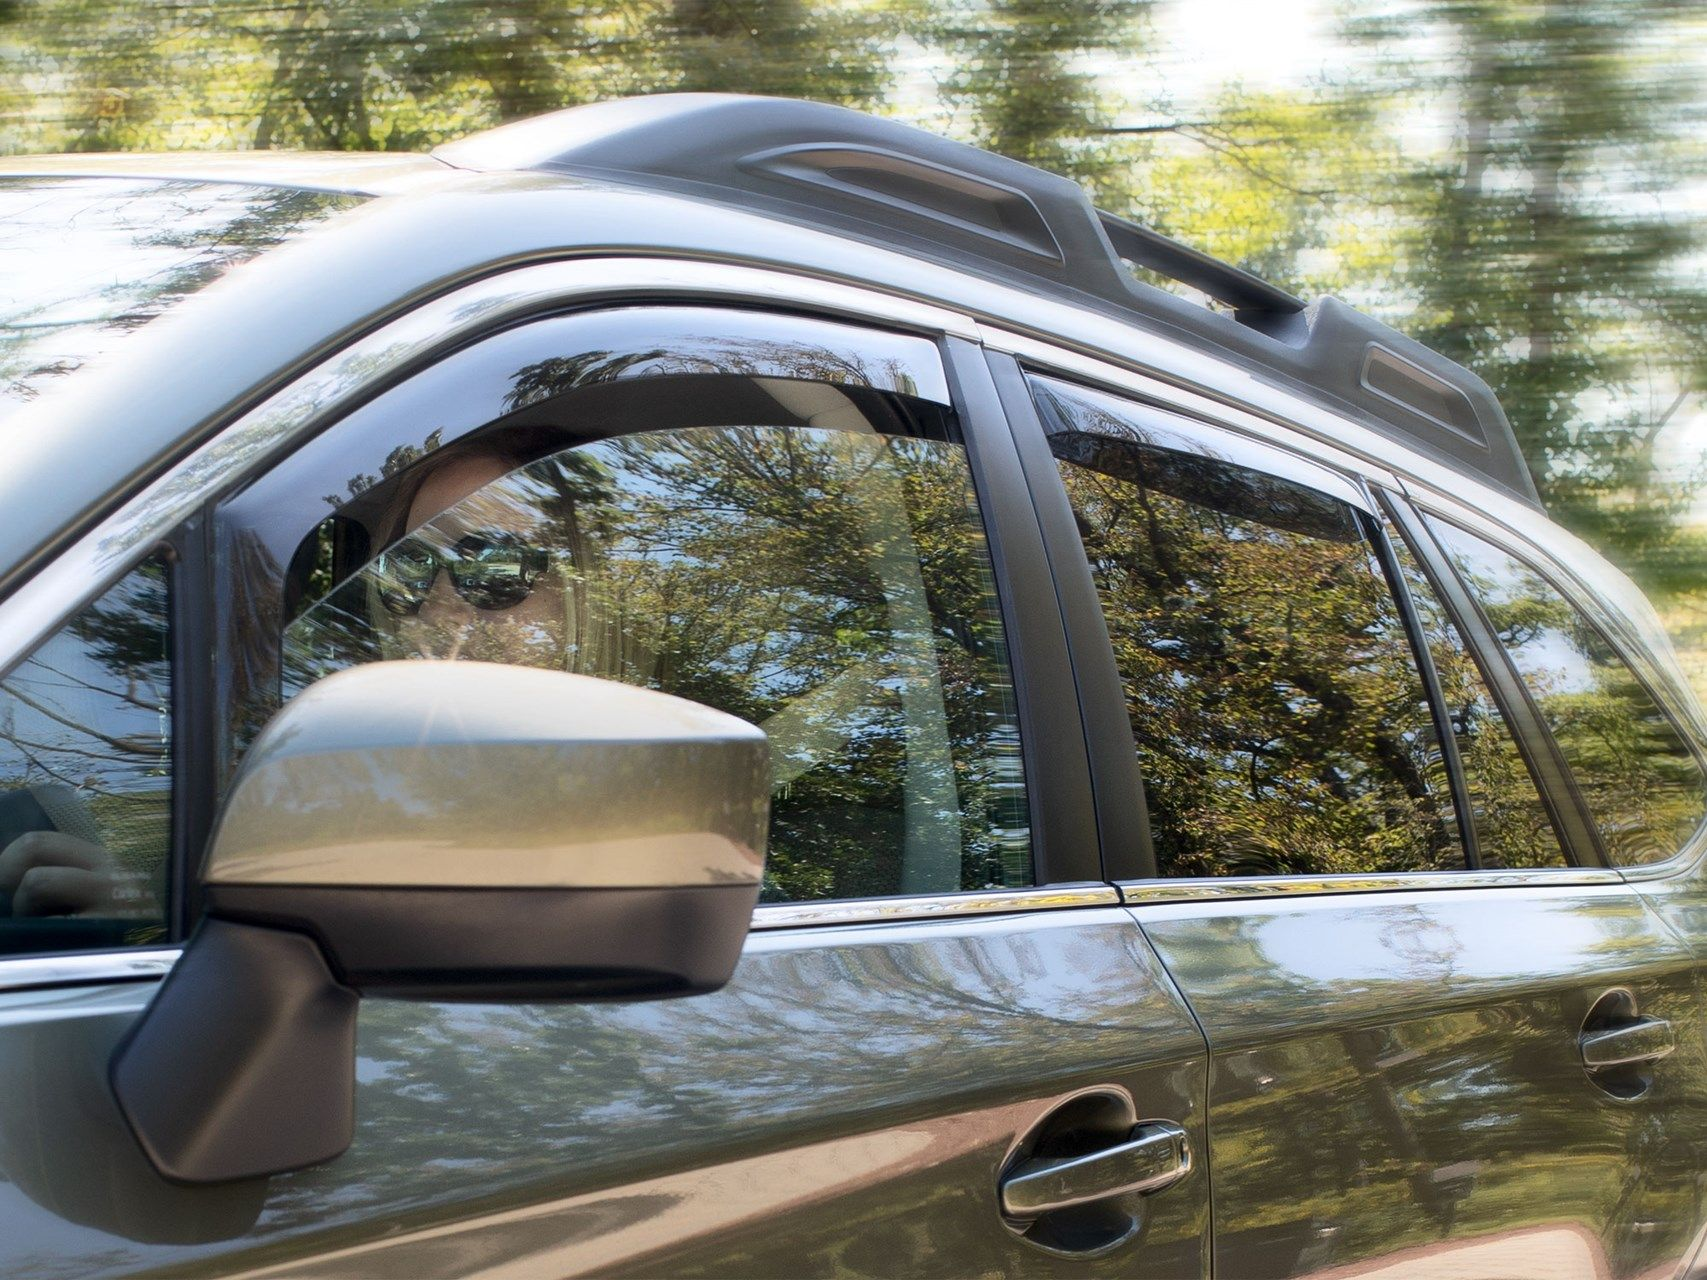 2015 Gmc Acadia Acadia Denali Rain Guards Side Window Deflectors For Cars Trucks Suvs And Minivans Weathe Gmc Trucks Custom Trucks Custom Pickup Trucks